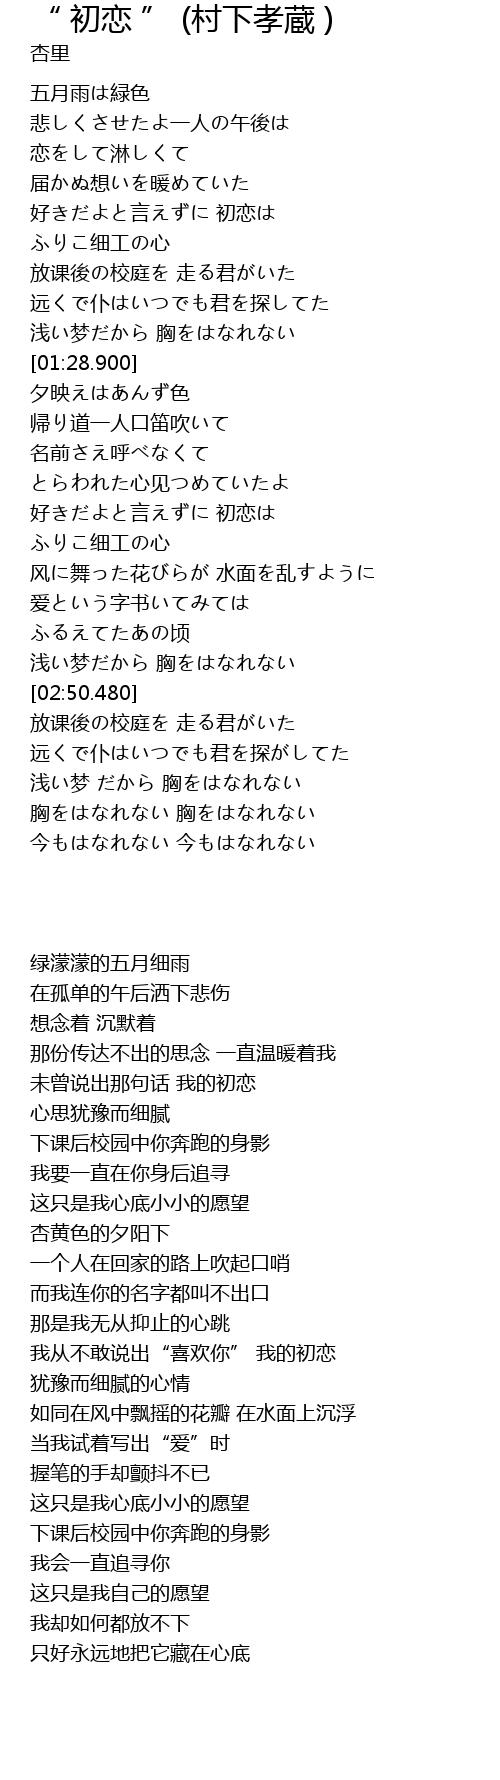 歌詞 村 下 孝蔵